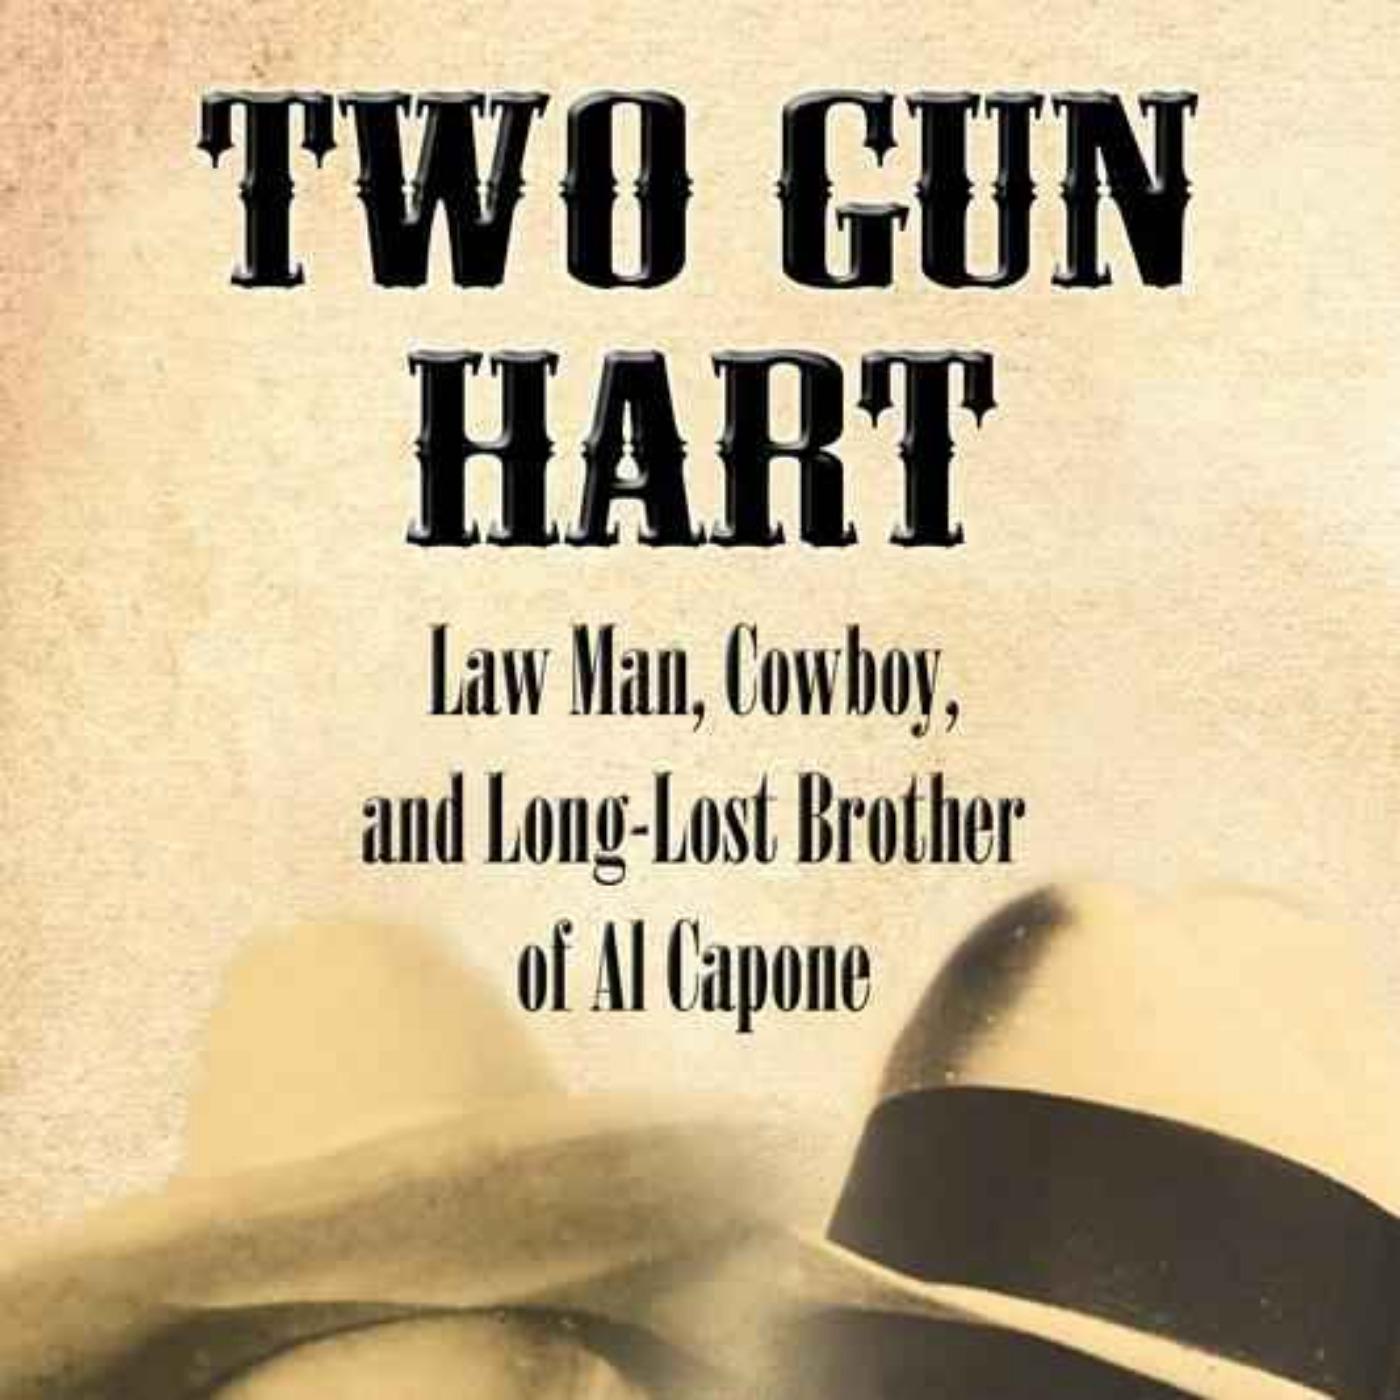 Jeff McArthur - Two Gun Heart